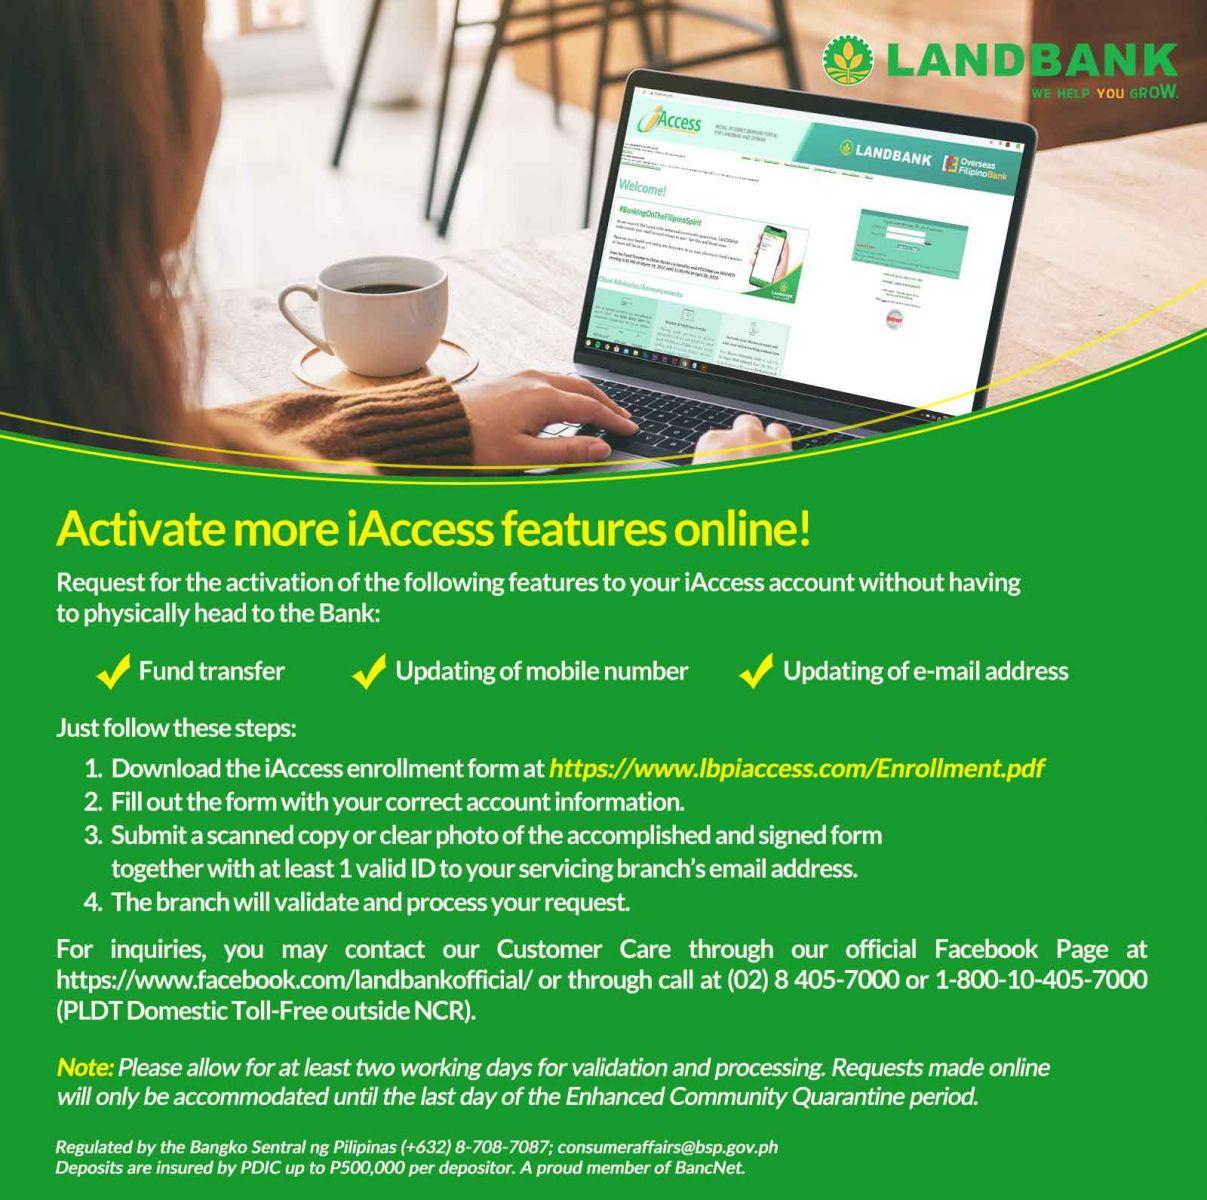 landbank iaccess